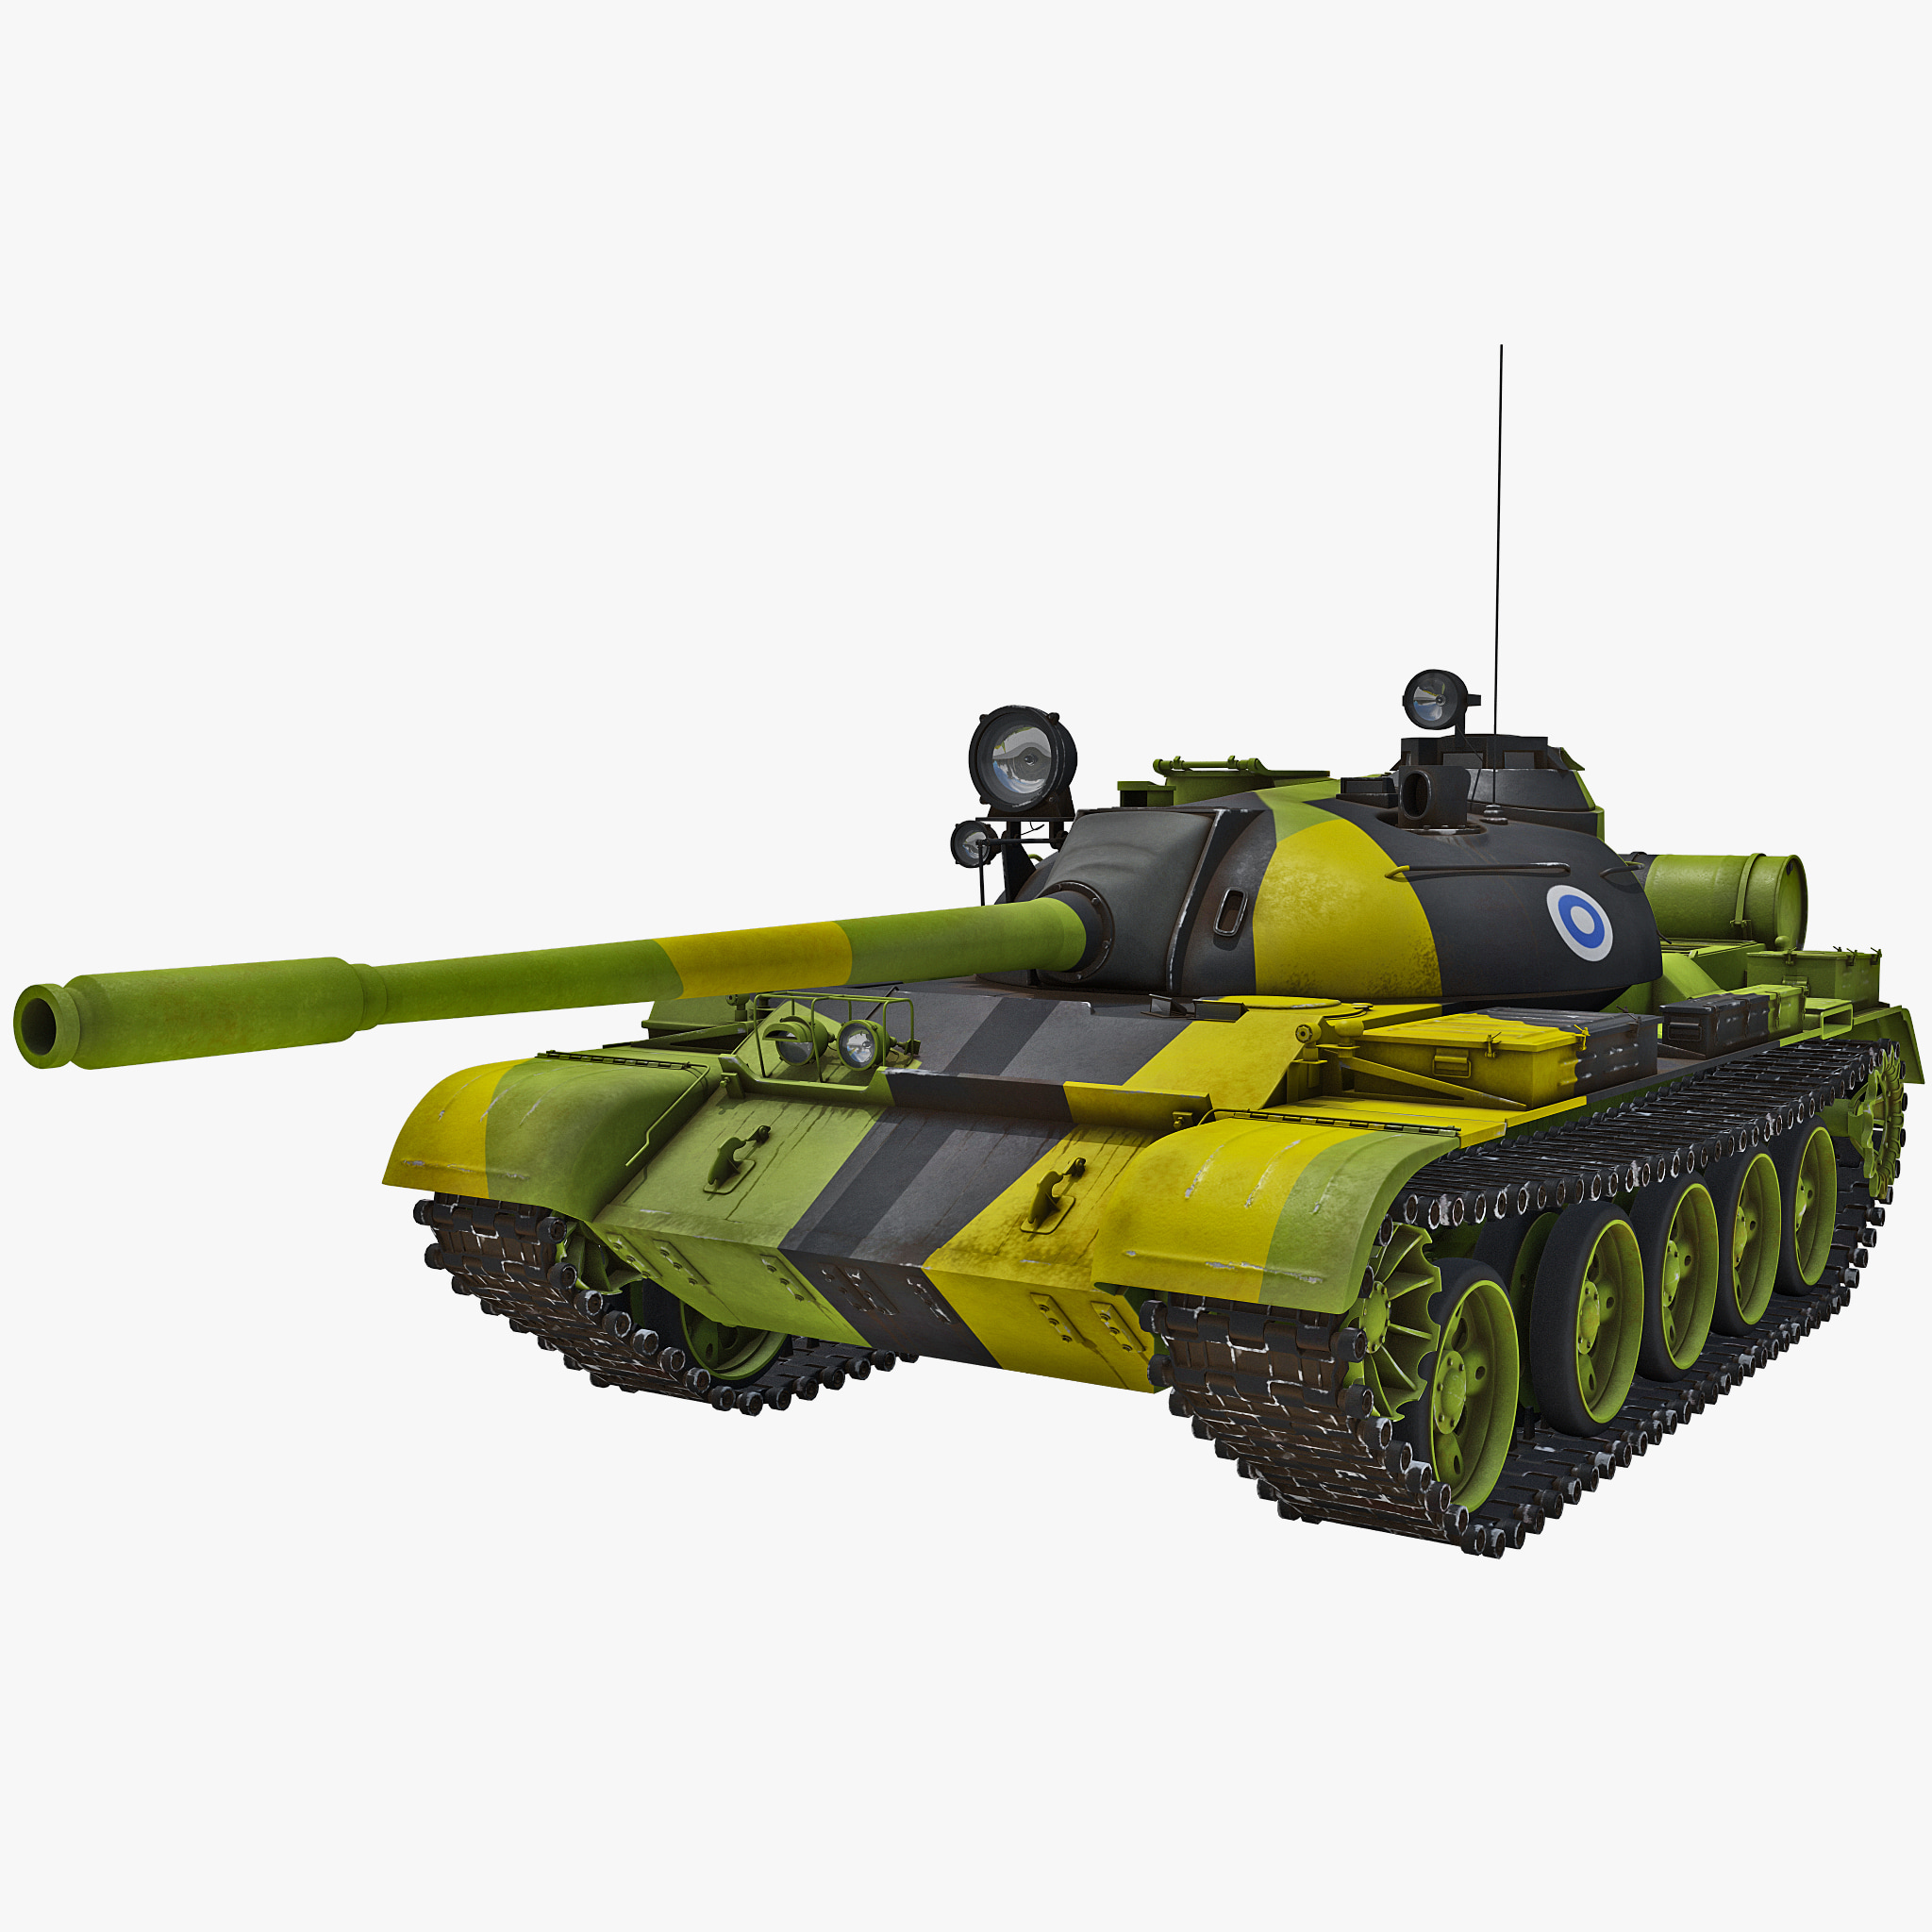 Soviet Union Main Battle Tank T-55 Rigged_1.jpg